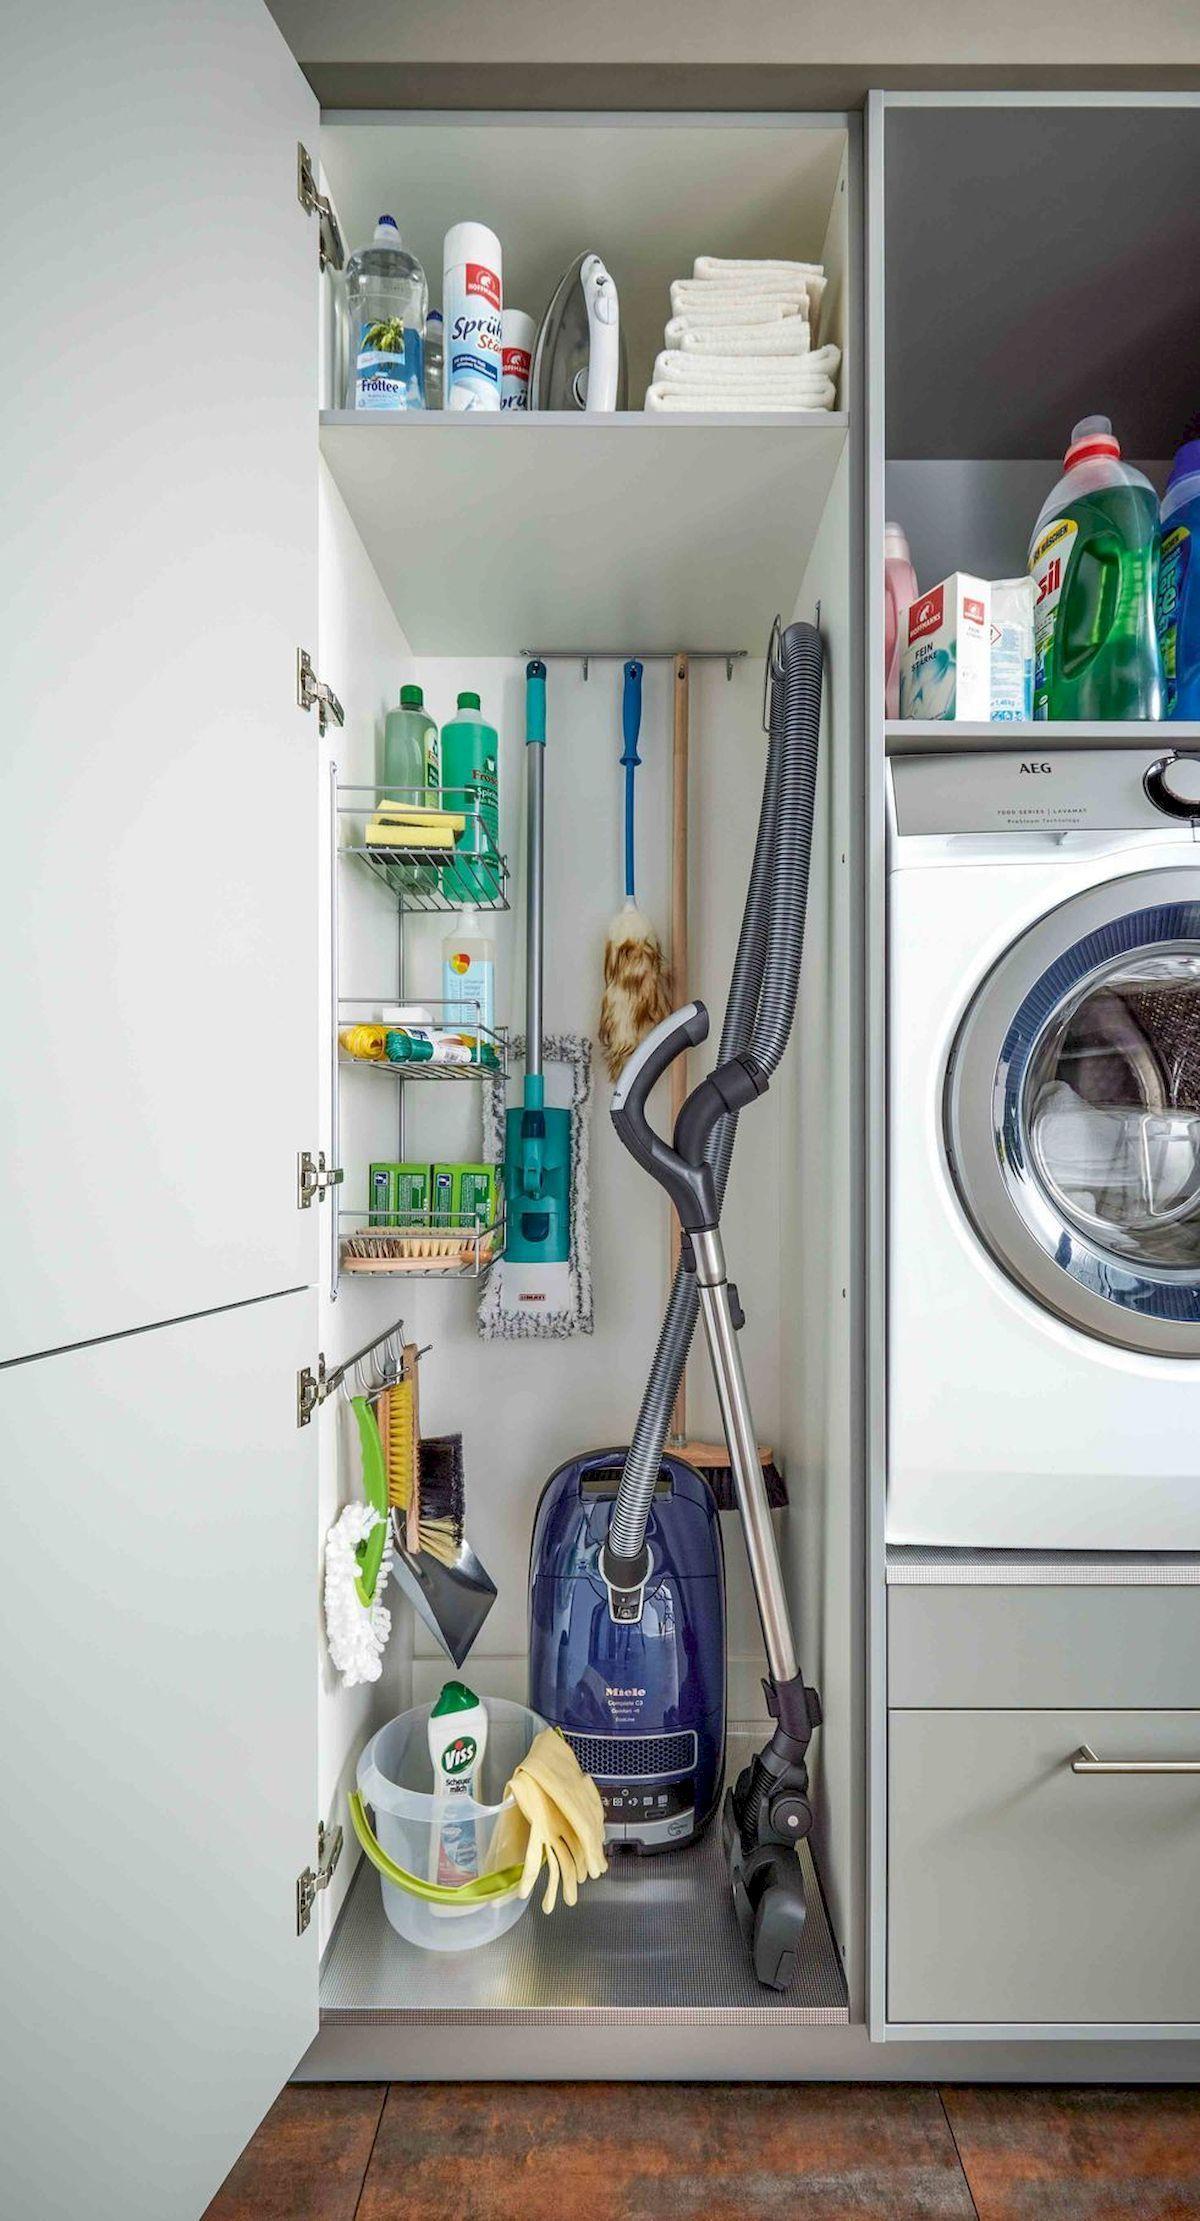 Marvelous Laundry Room With Best Storage Ideas – jihanshanum